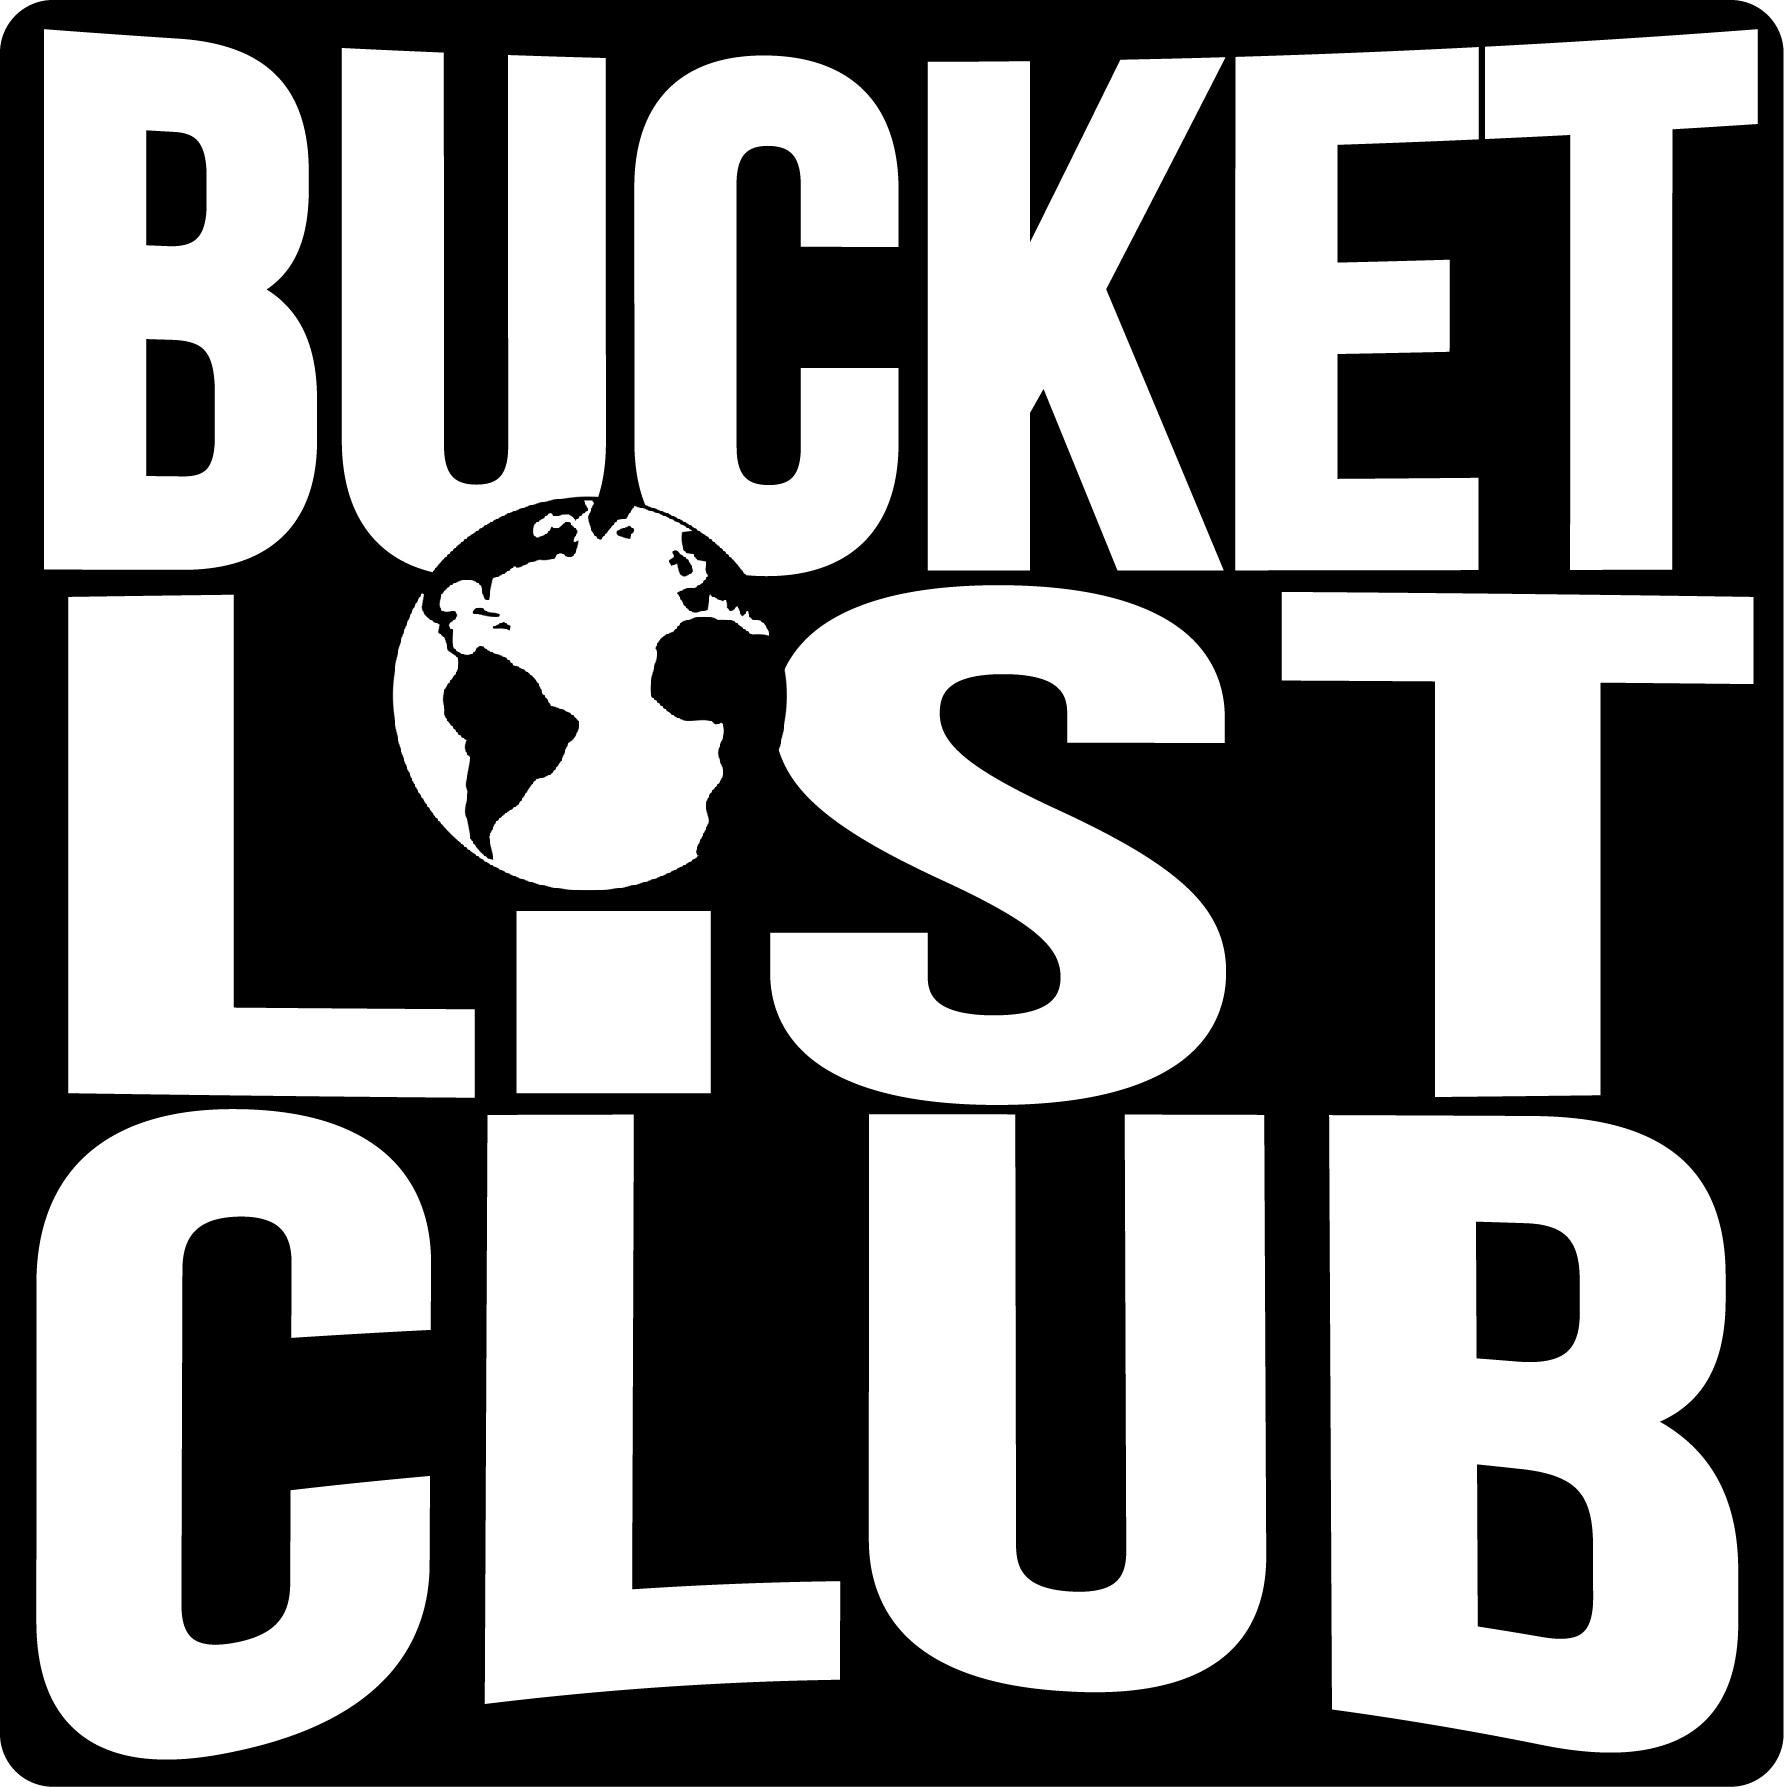 Bucketlist final.jpg